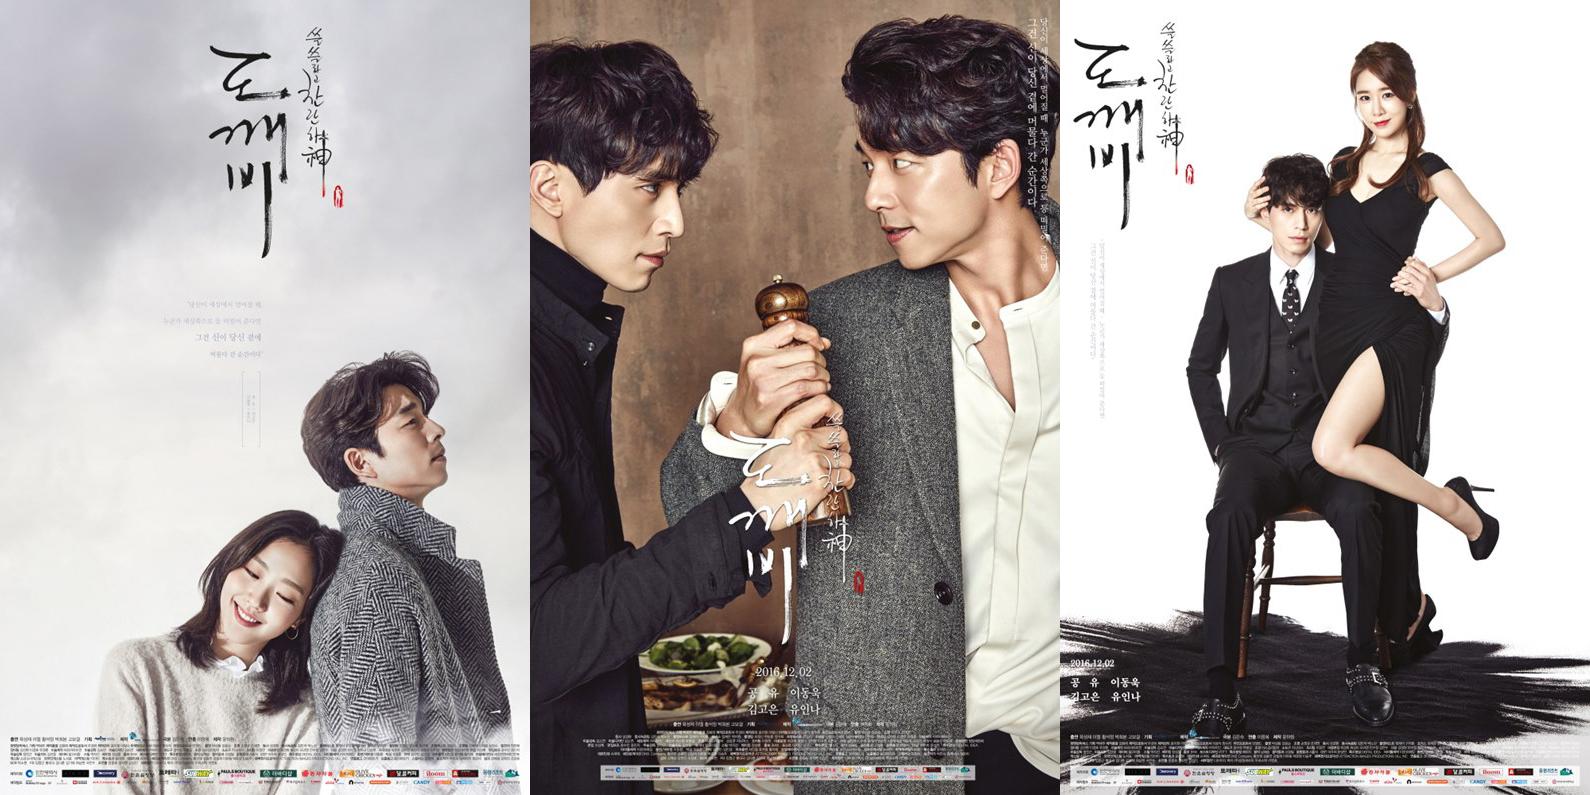 big korean drama hot girls wallpaper